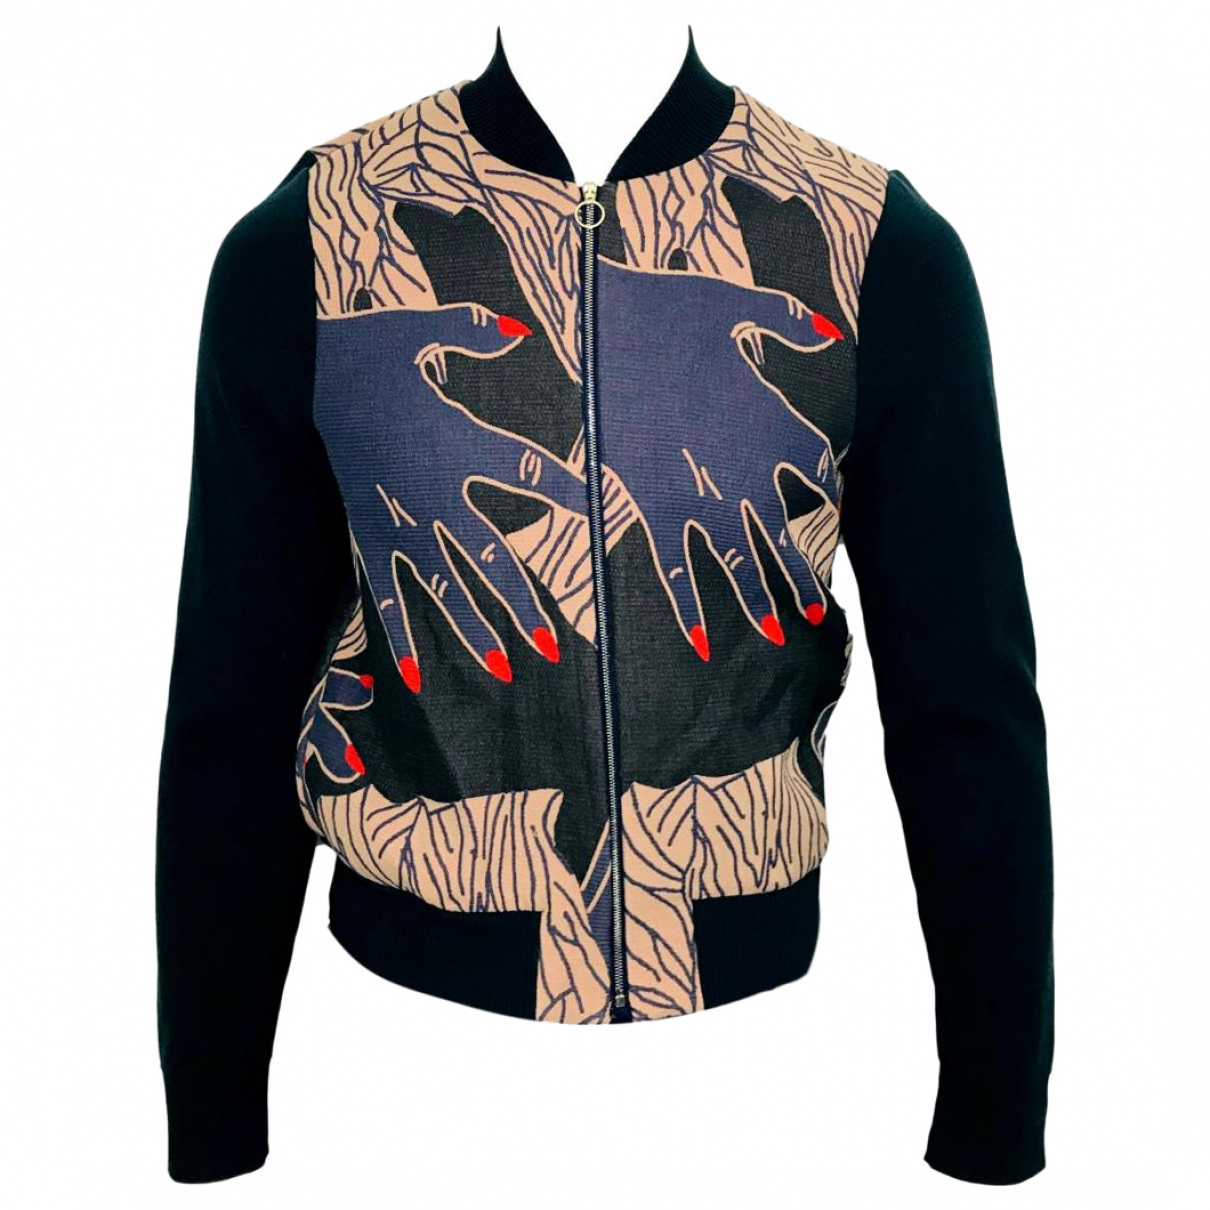 Paul Smith \N Multicolour Cotton jacket  for Men S International